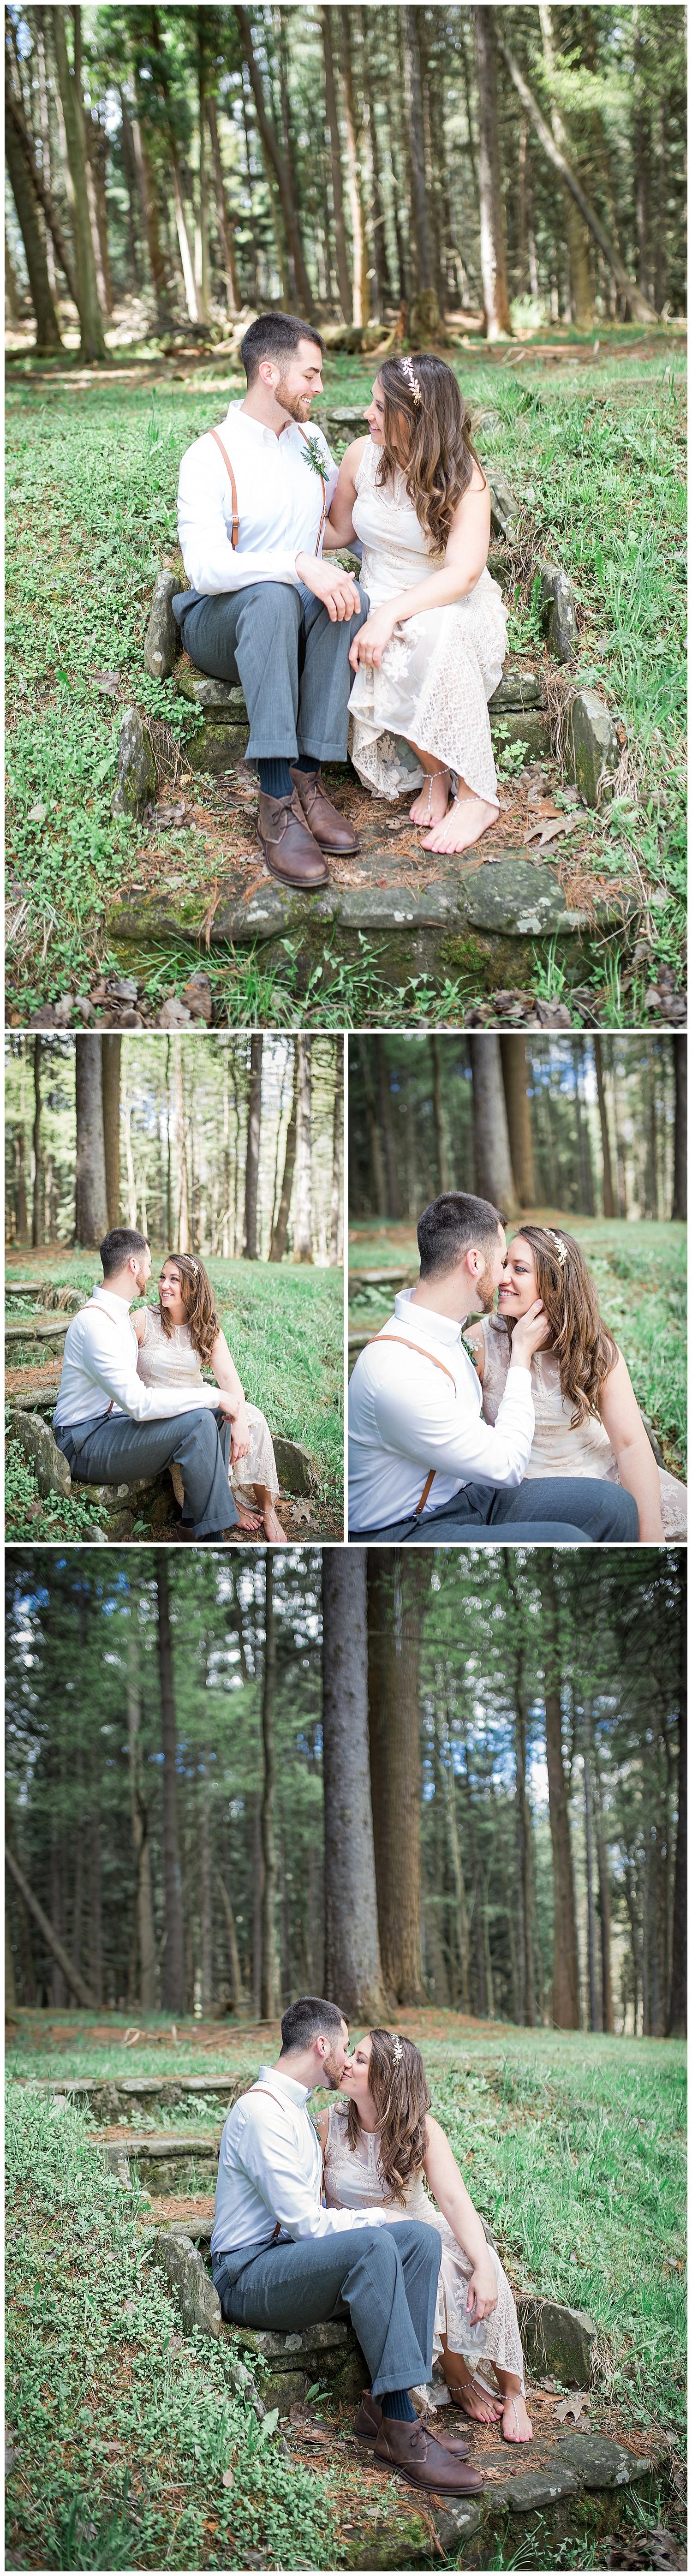 Letchworth state park wedding - whimsical boho romance - rochester 3.jpg